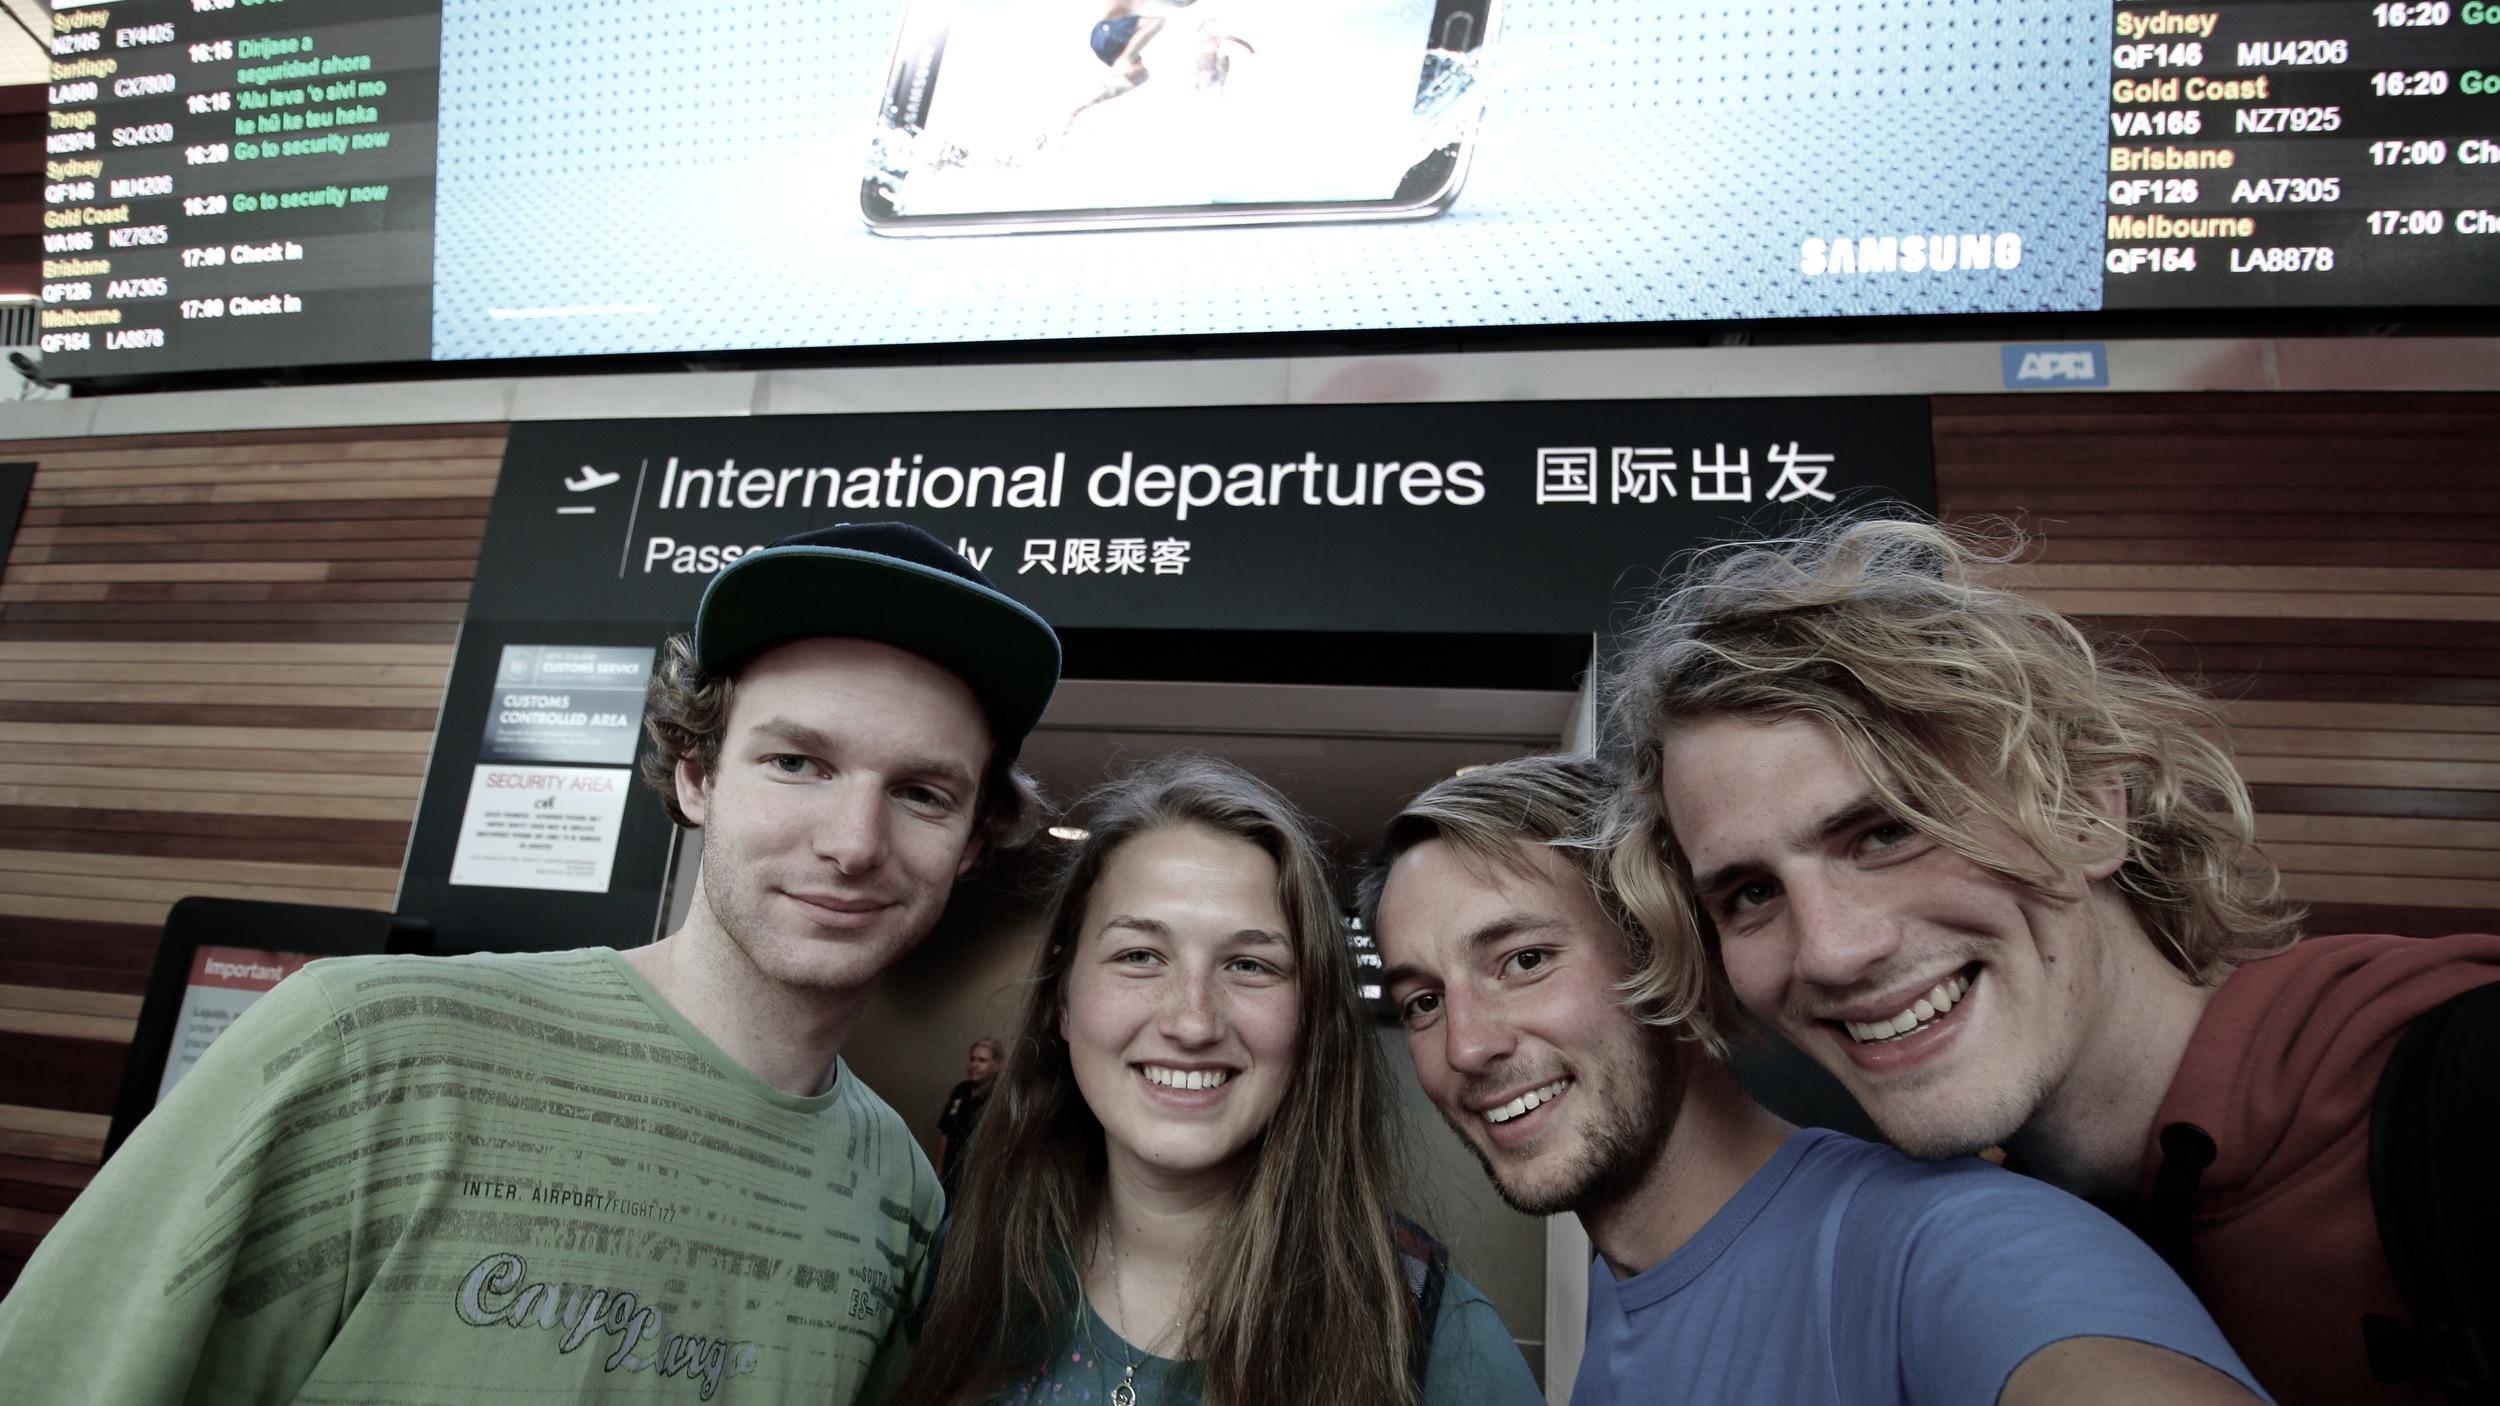 Crishi, Verena, Me and Thorben